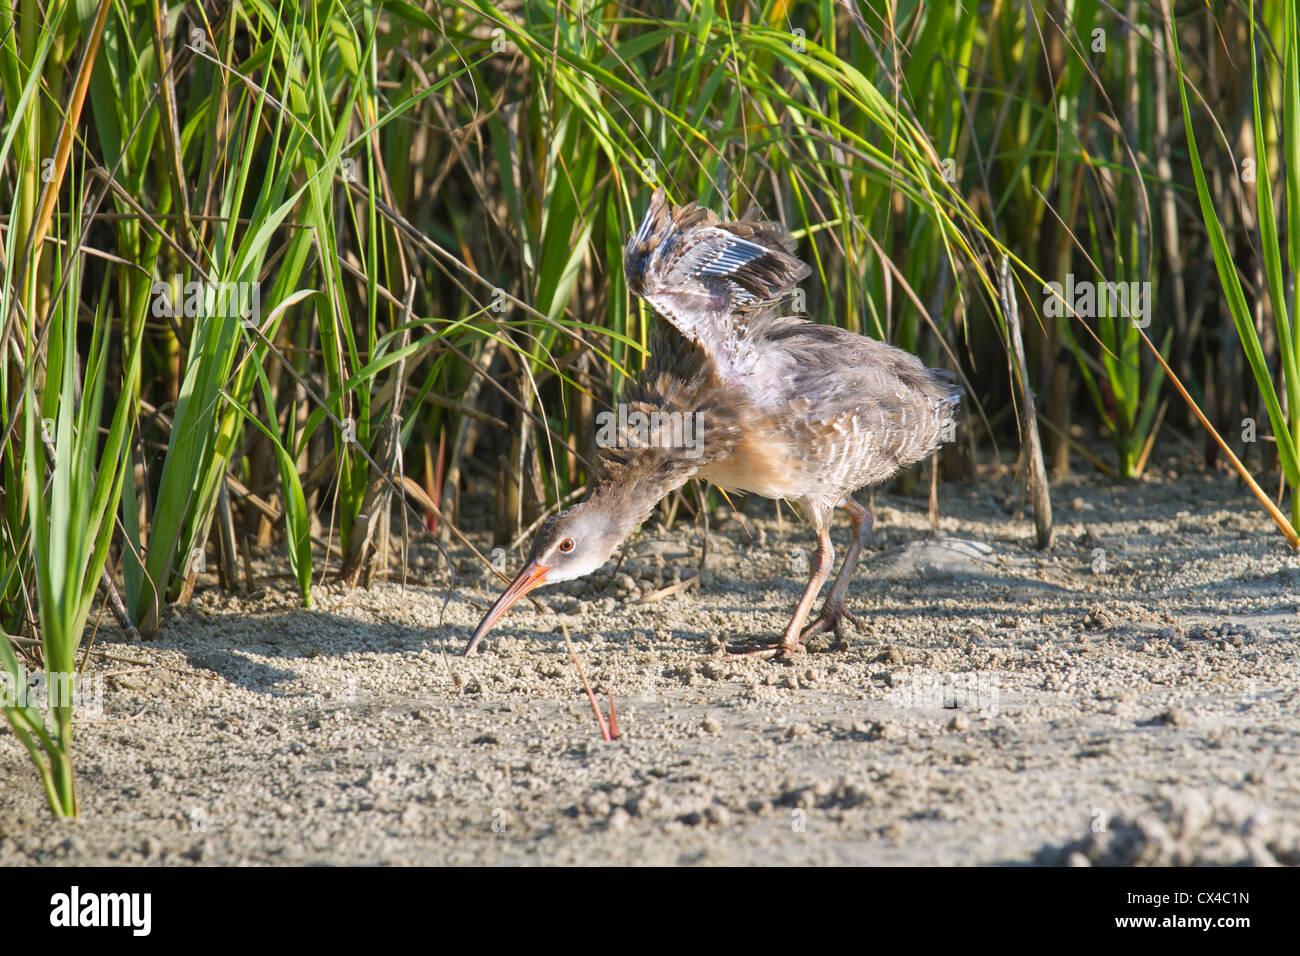 Virginia Rail (Rallus limicola) chick - Stock Image